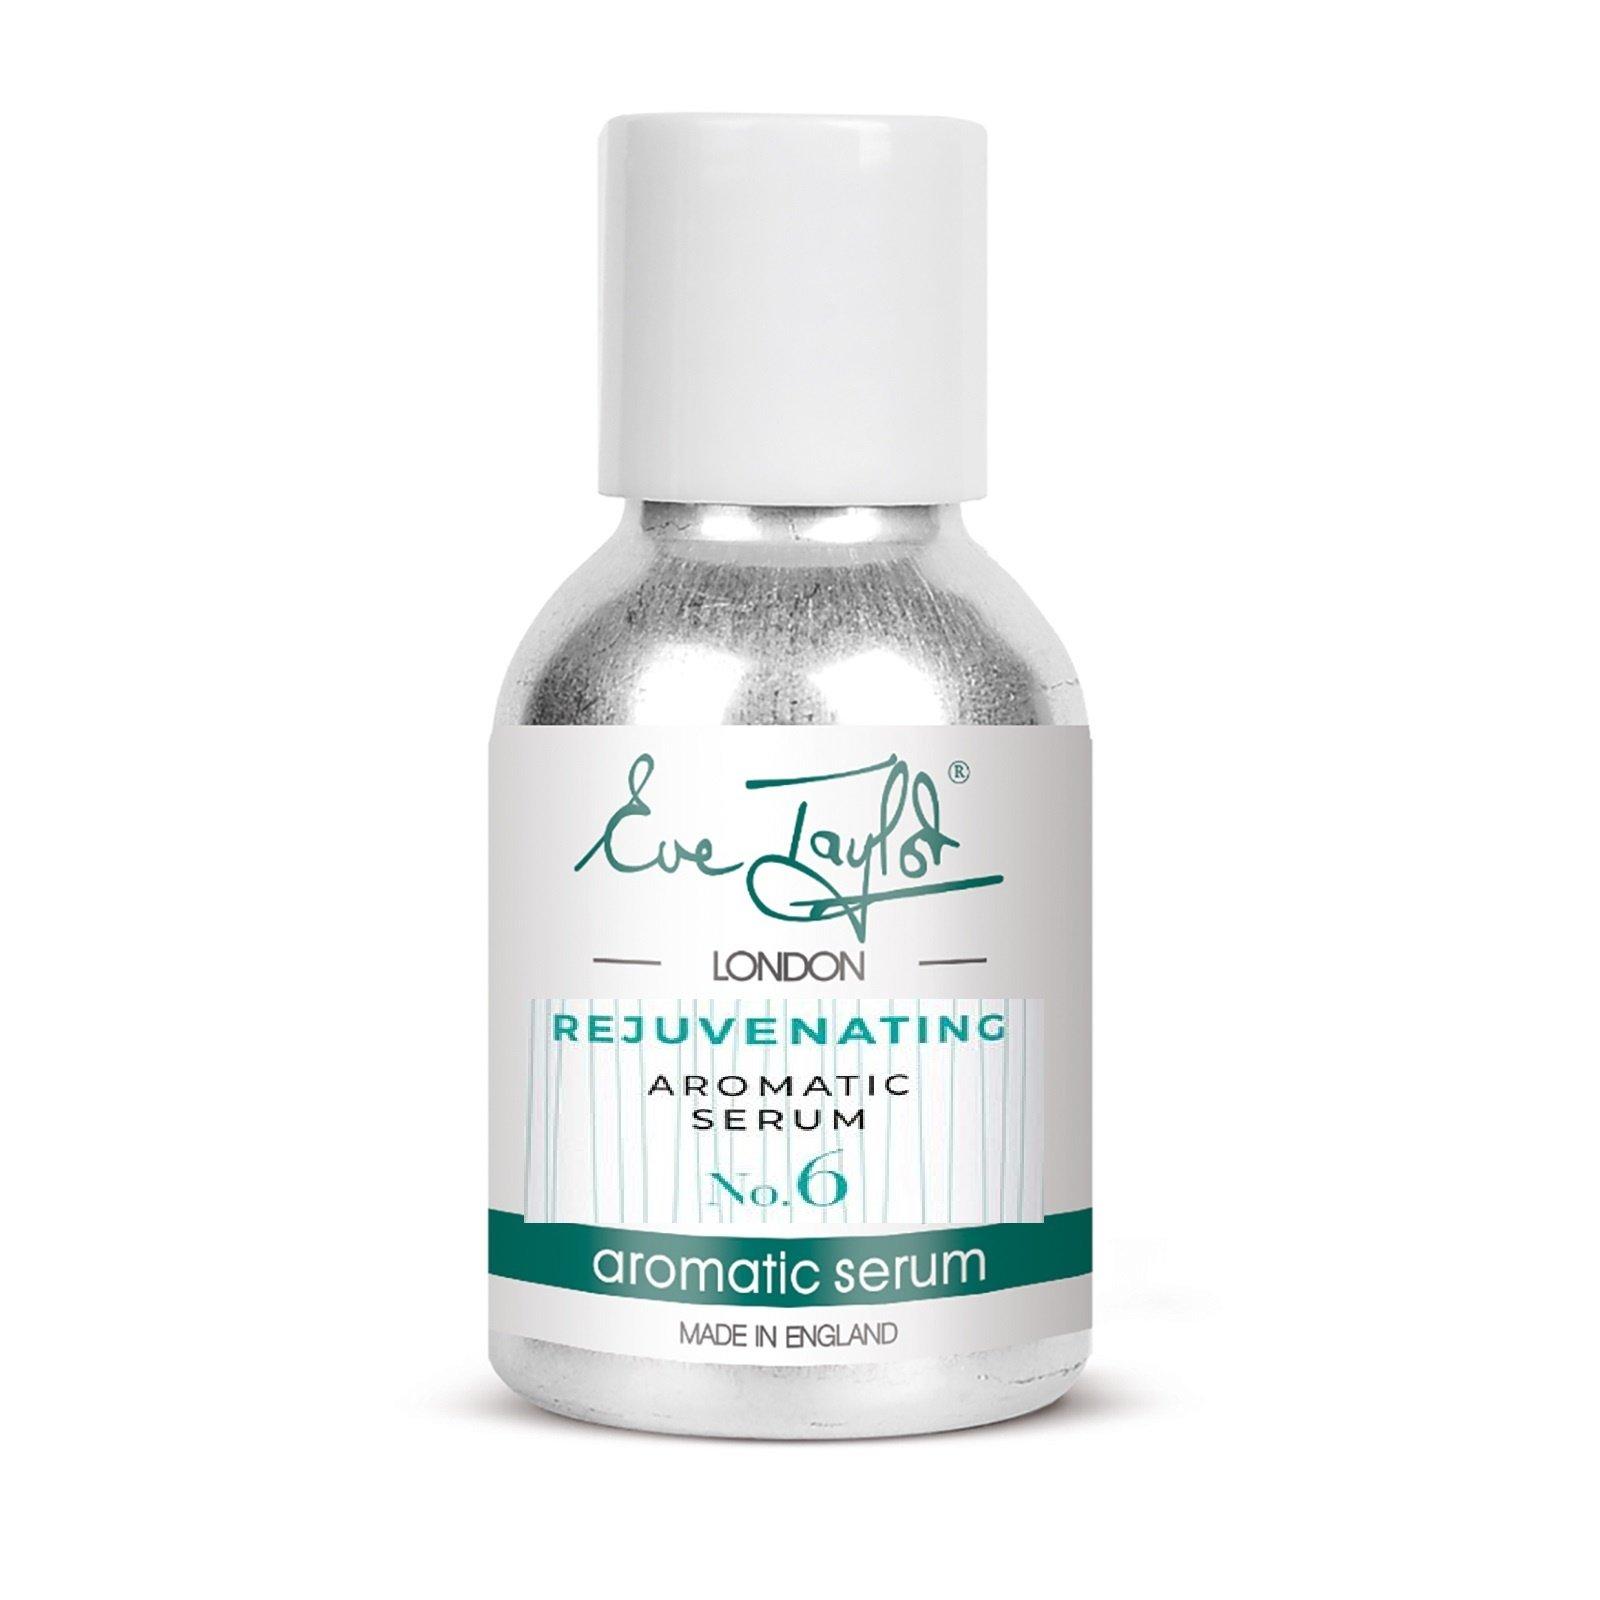 Eve Taylor Rejuvenating Aromatic Serum (No.6) - Eve Taylor